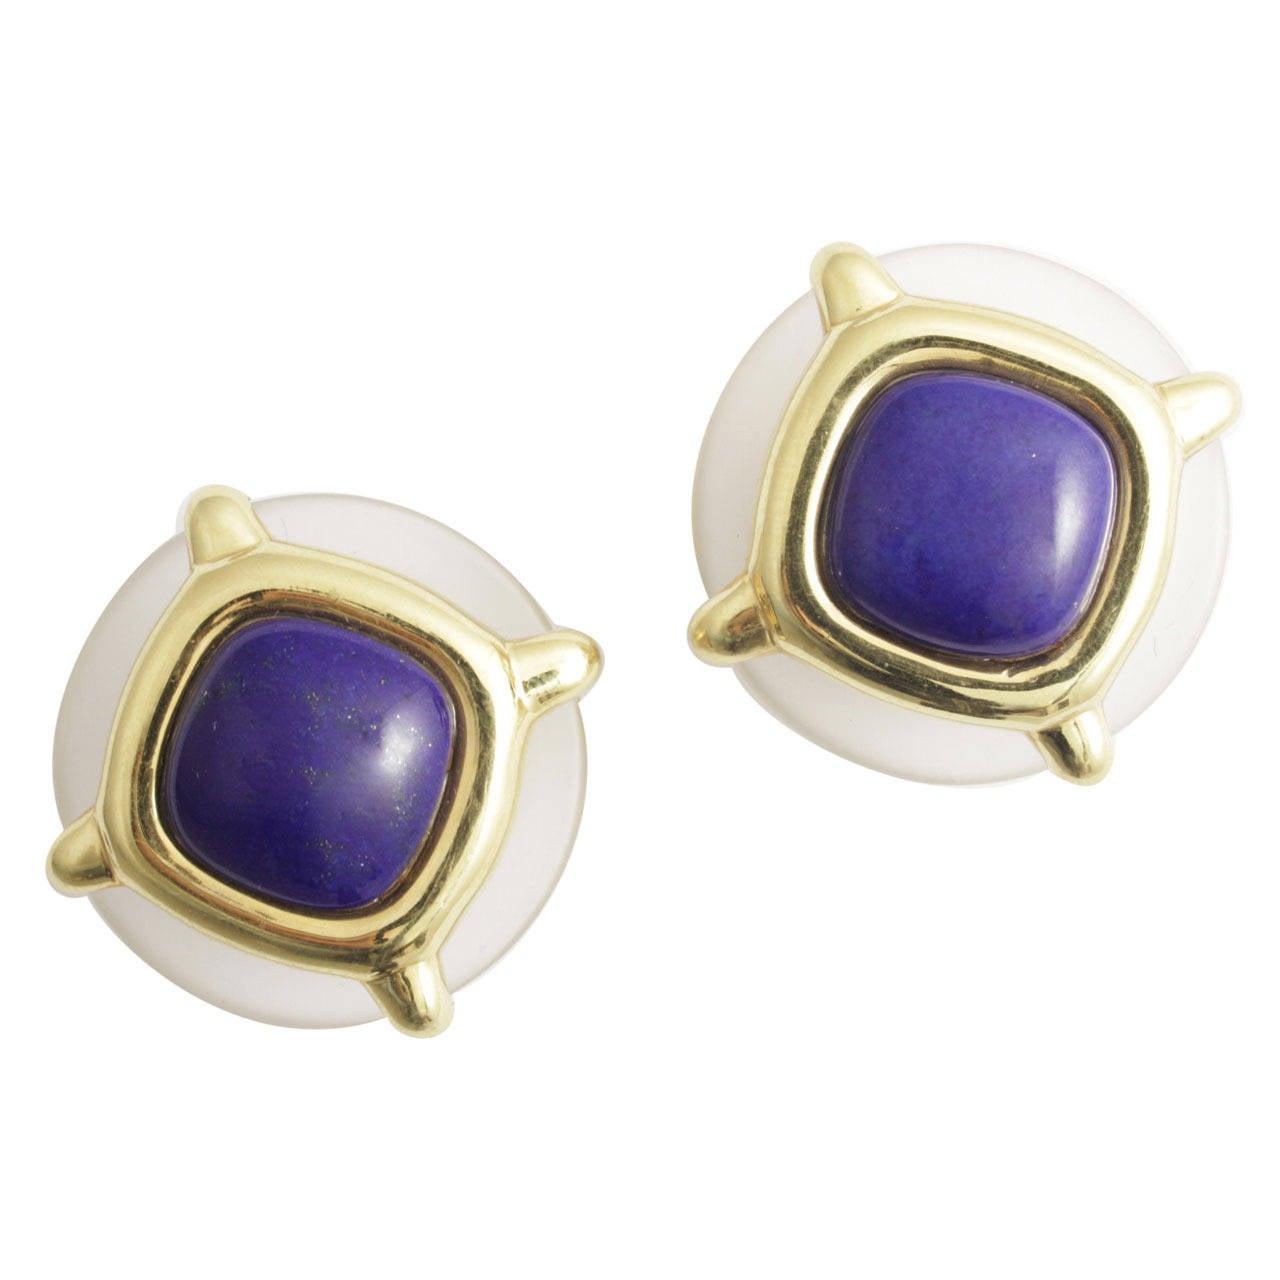 1973 Aldo Cipullo Rock Crystal Lapis Gold Earrings